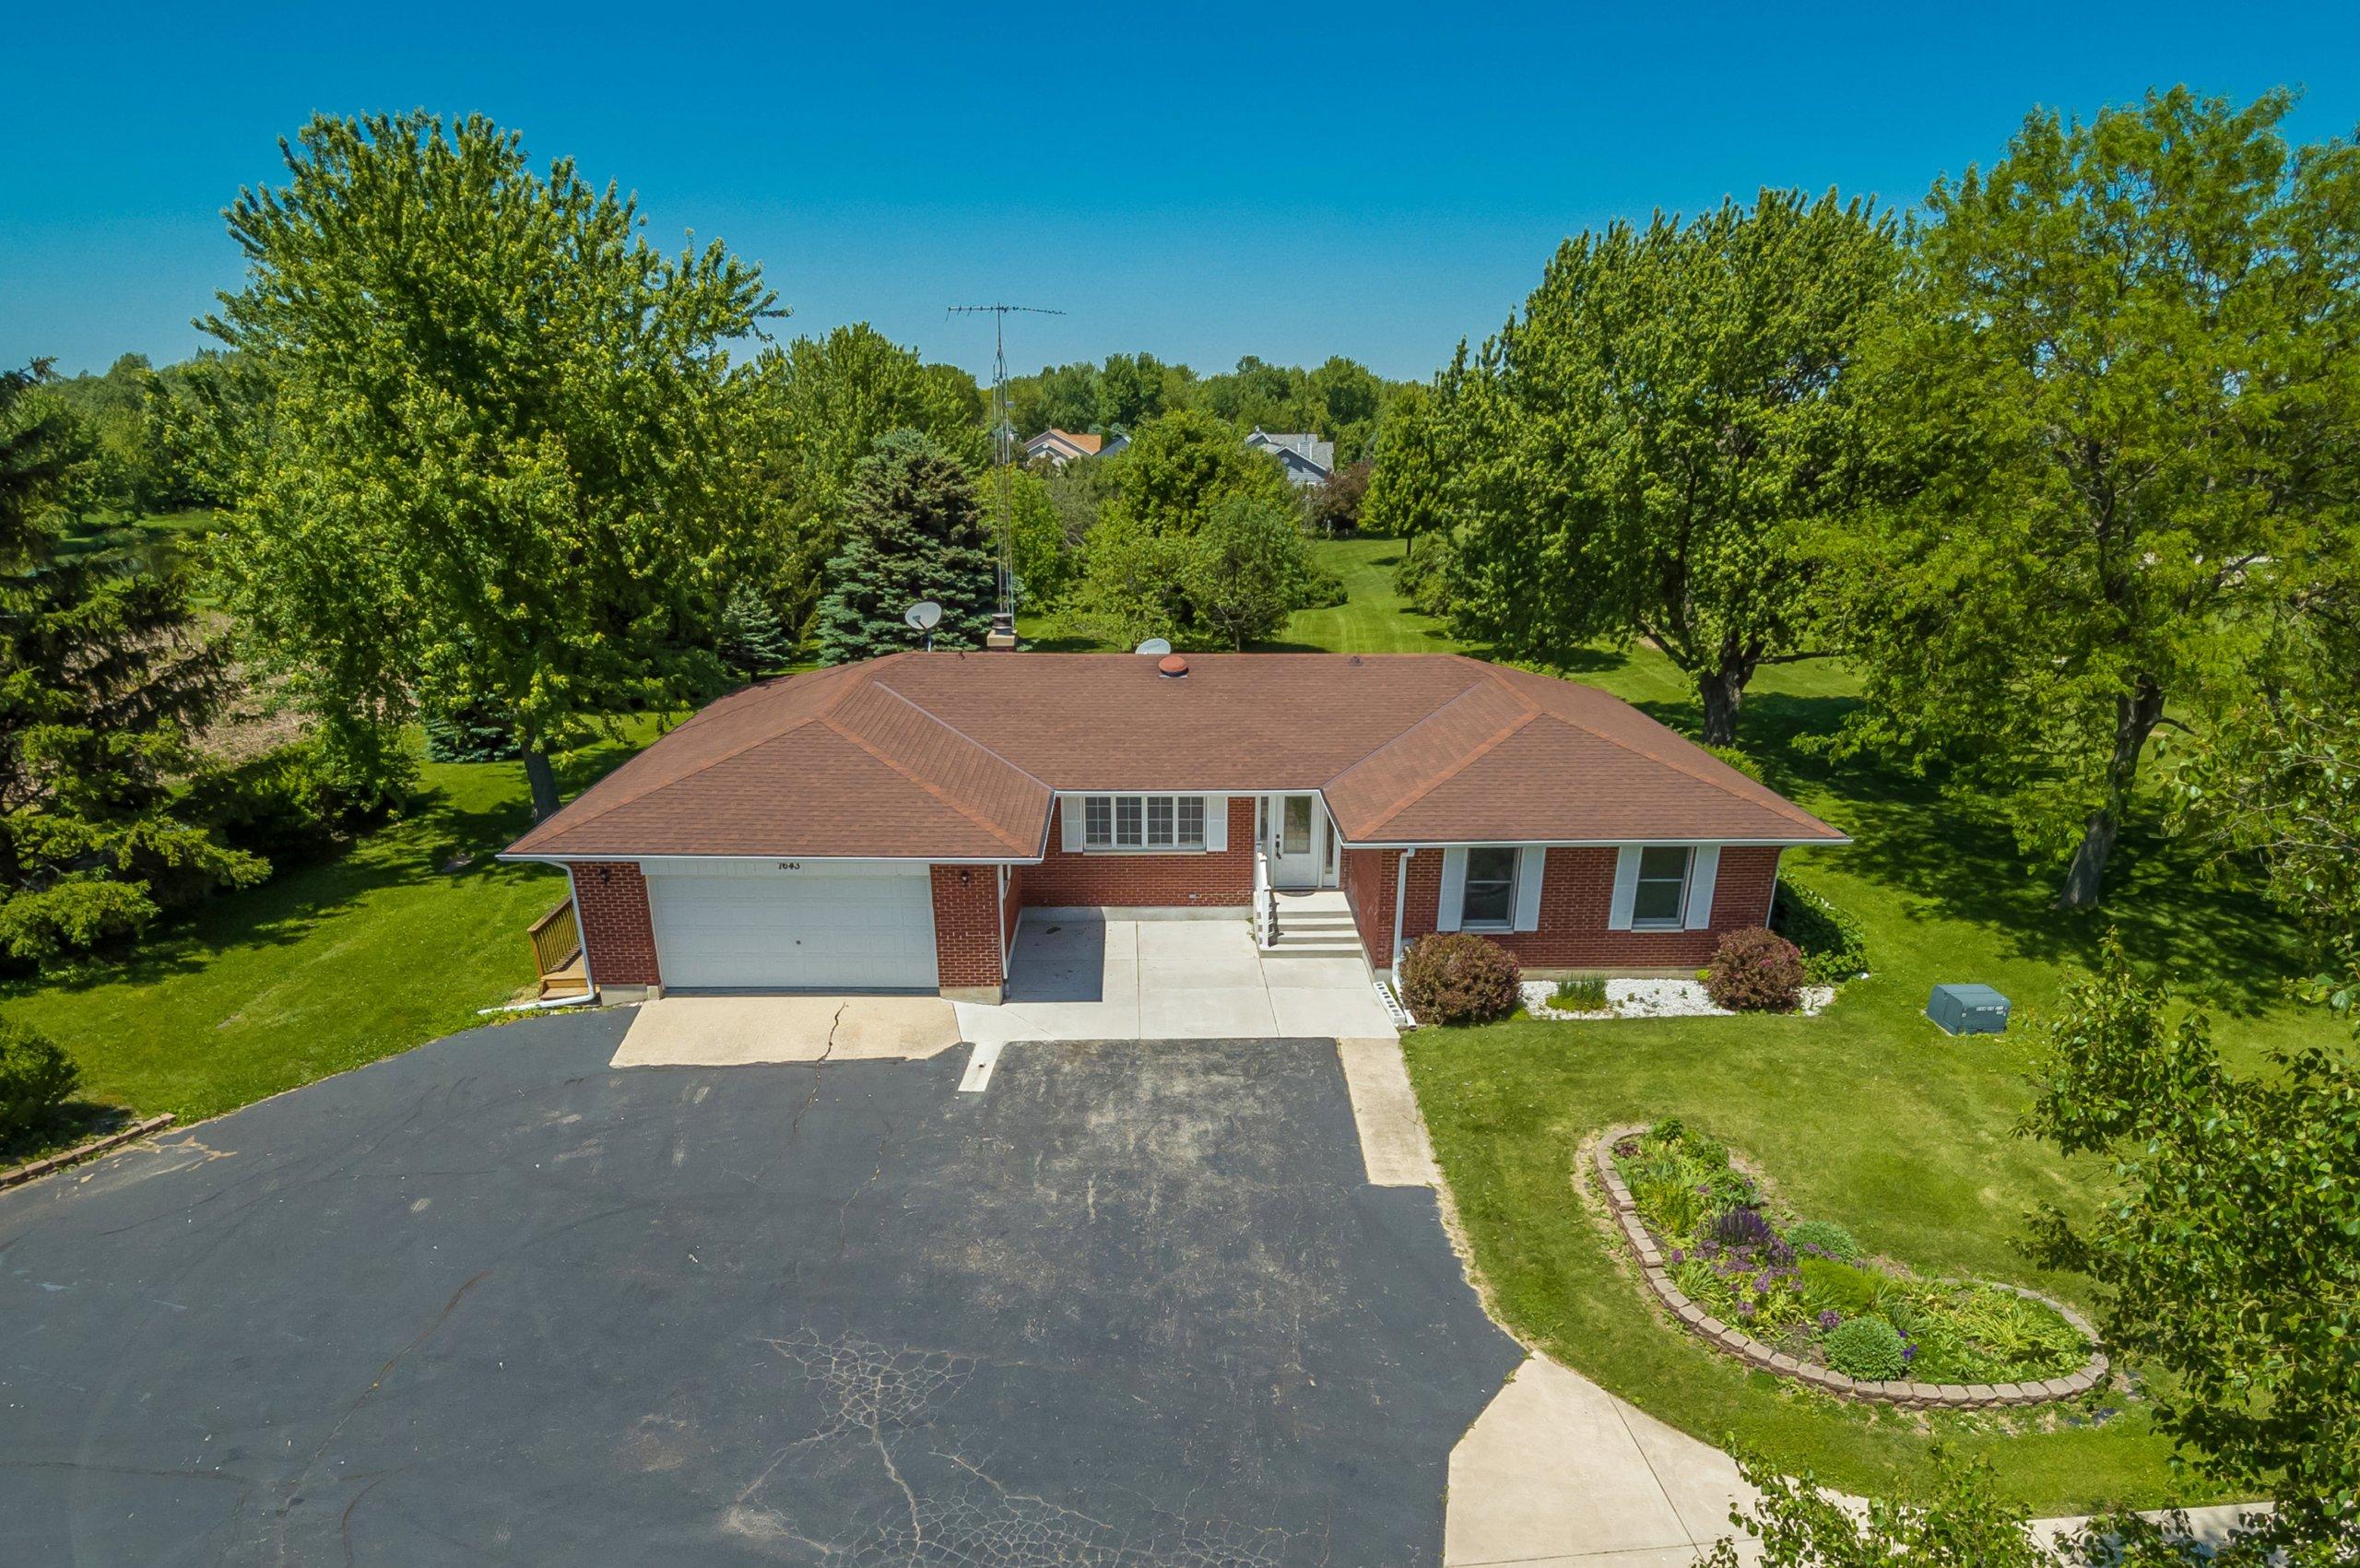 Drone aerial 18 of 7643 E. Sandwich Rd., Hinckley, Illinois